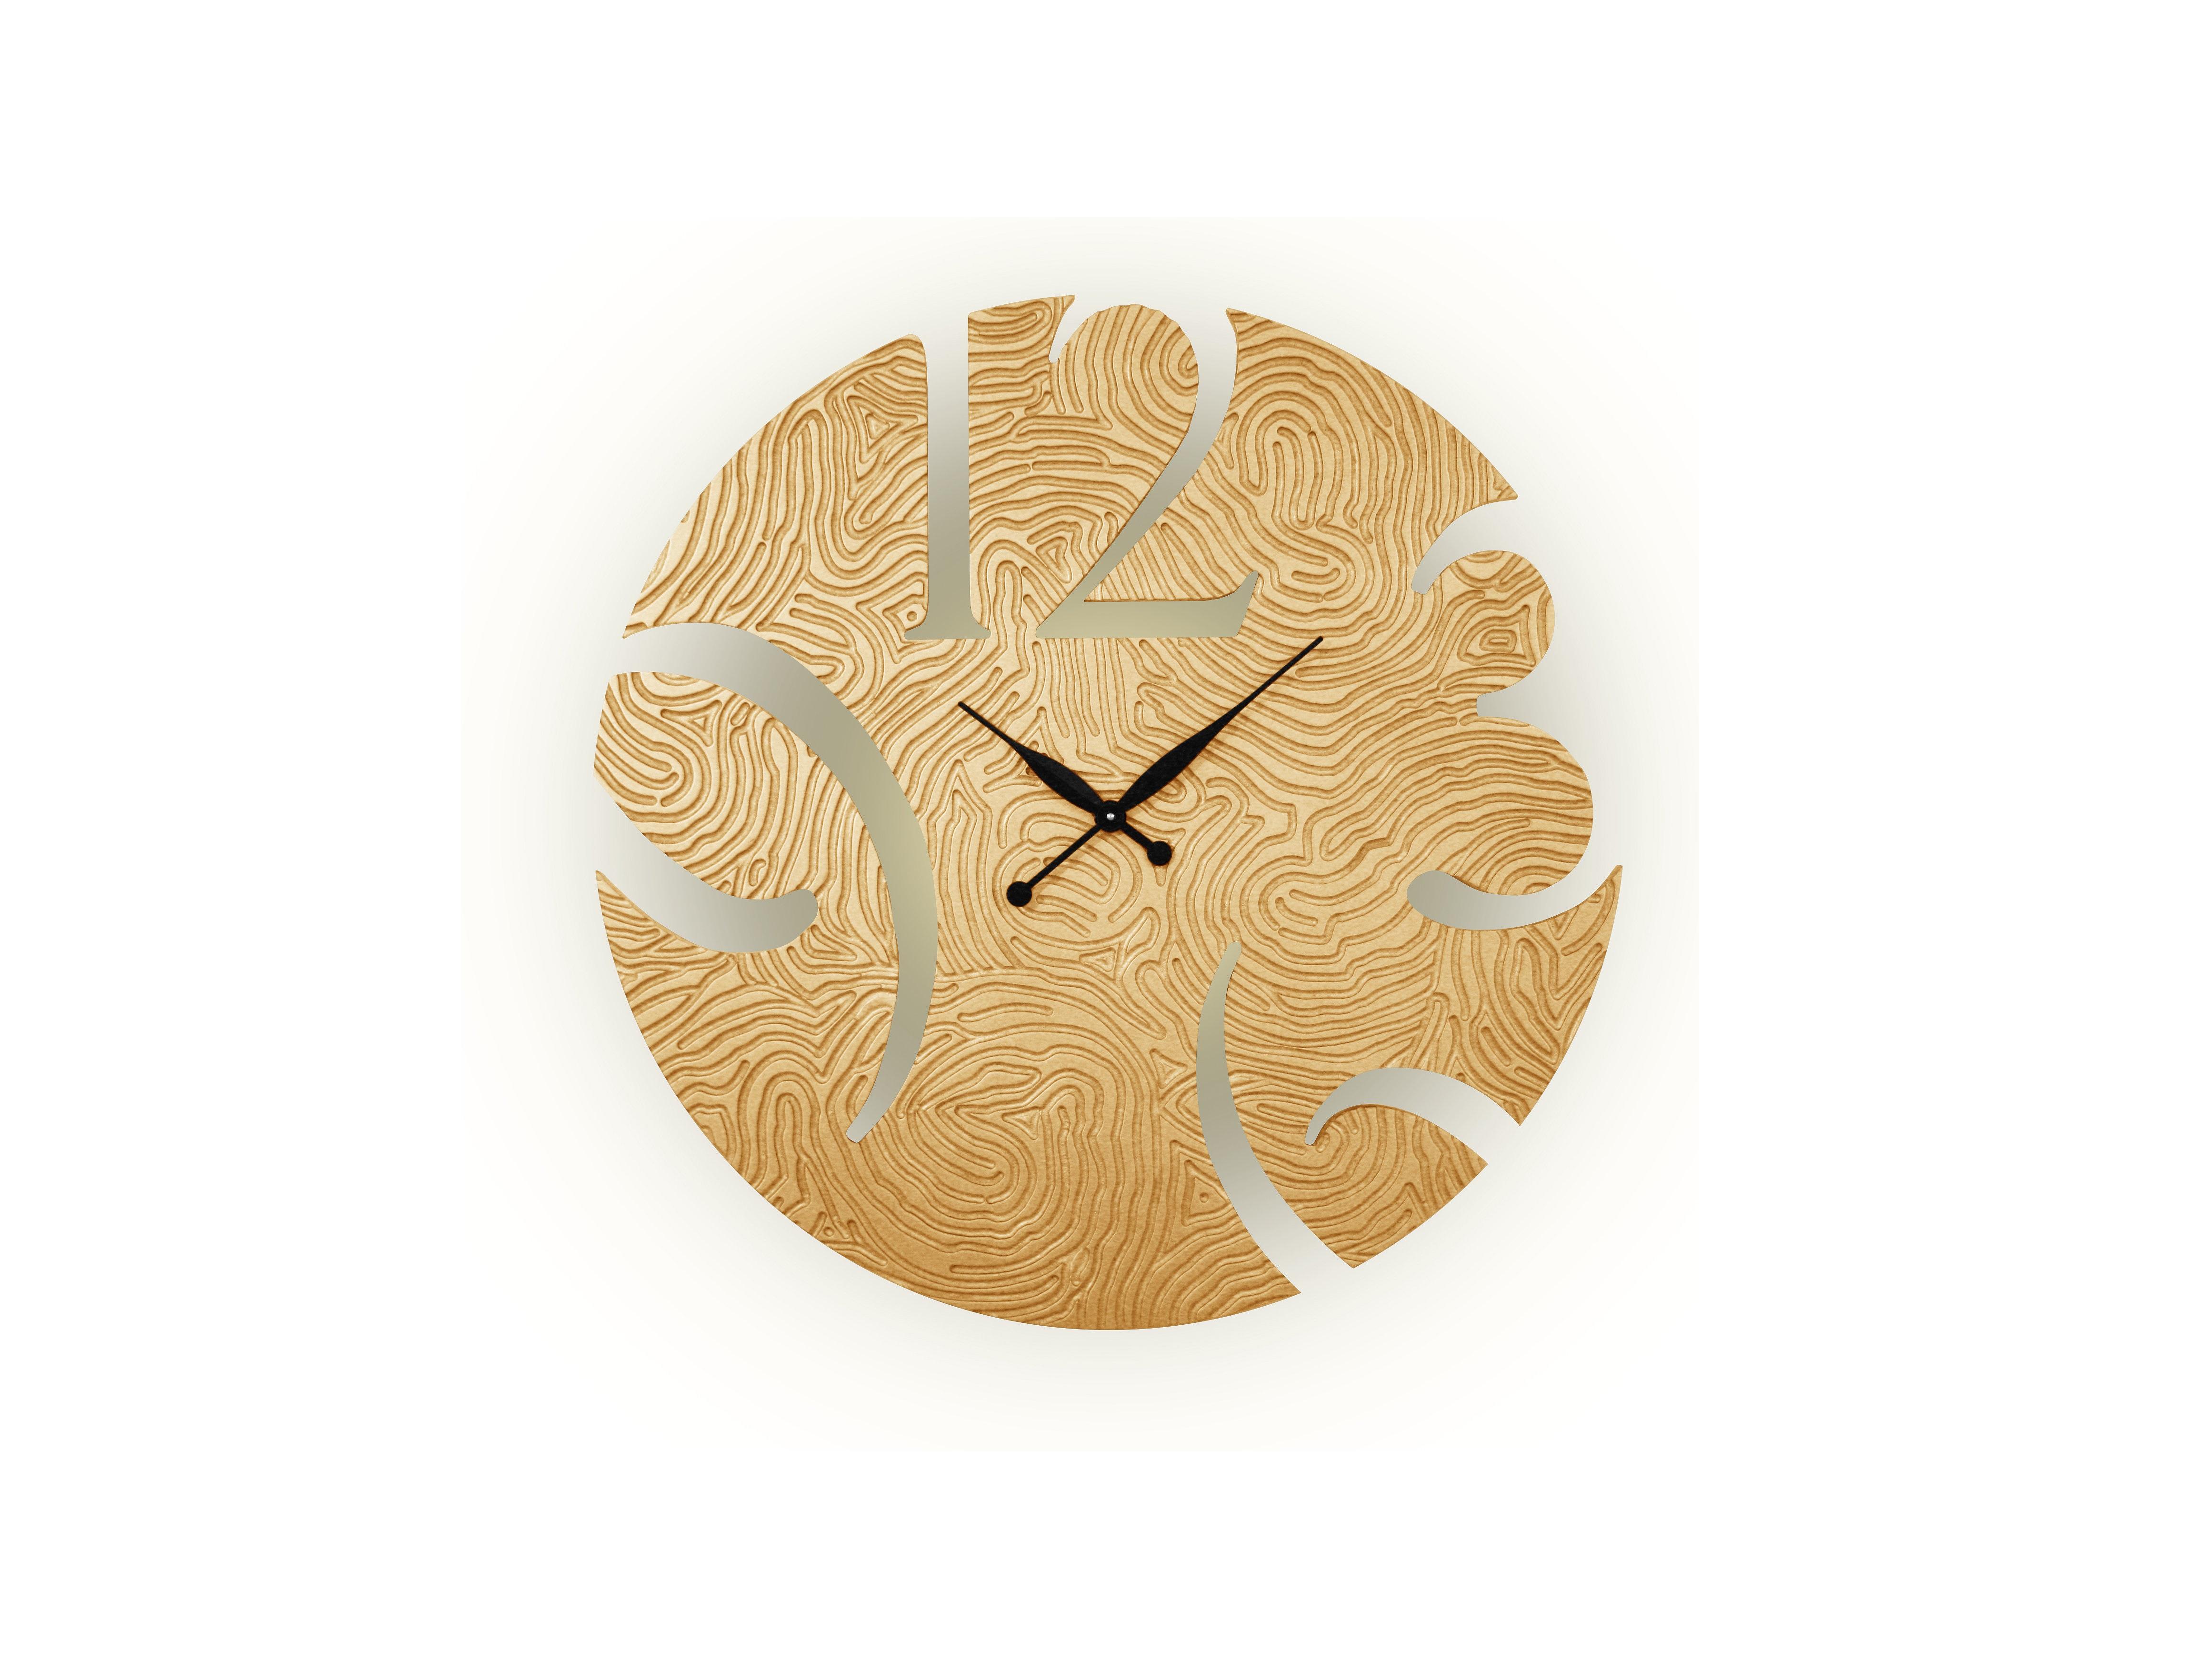 Часы PrintНастенные часы<br>Кварцевый механизм<br><br>Material: Дерево<br>Depth см: 0.8<br>Height см: None<br>Diameter см: 90